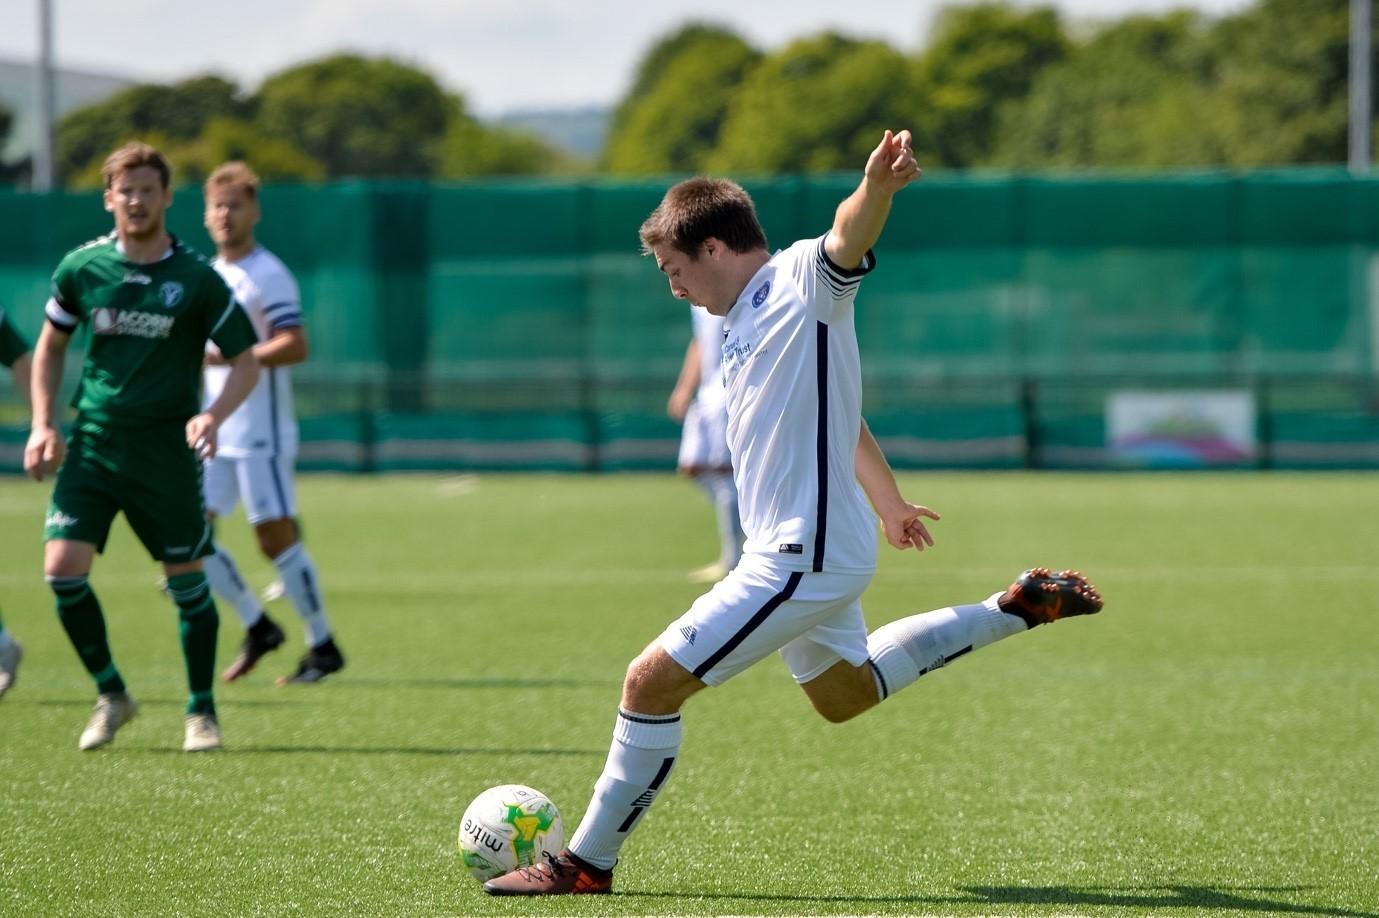 Goals galore as Ilkley thrash Boroughbridge